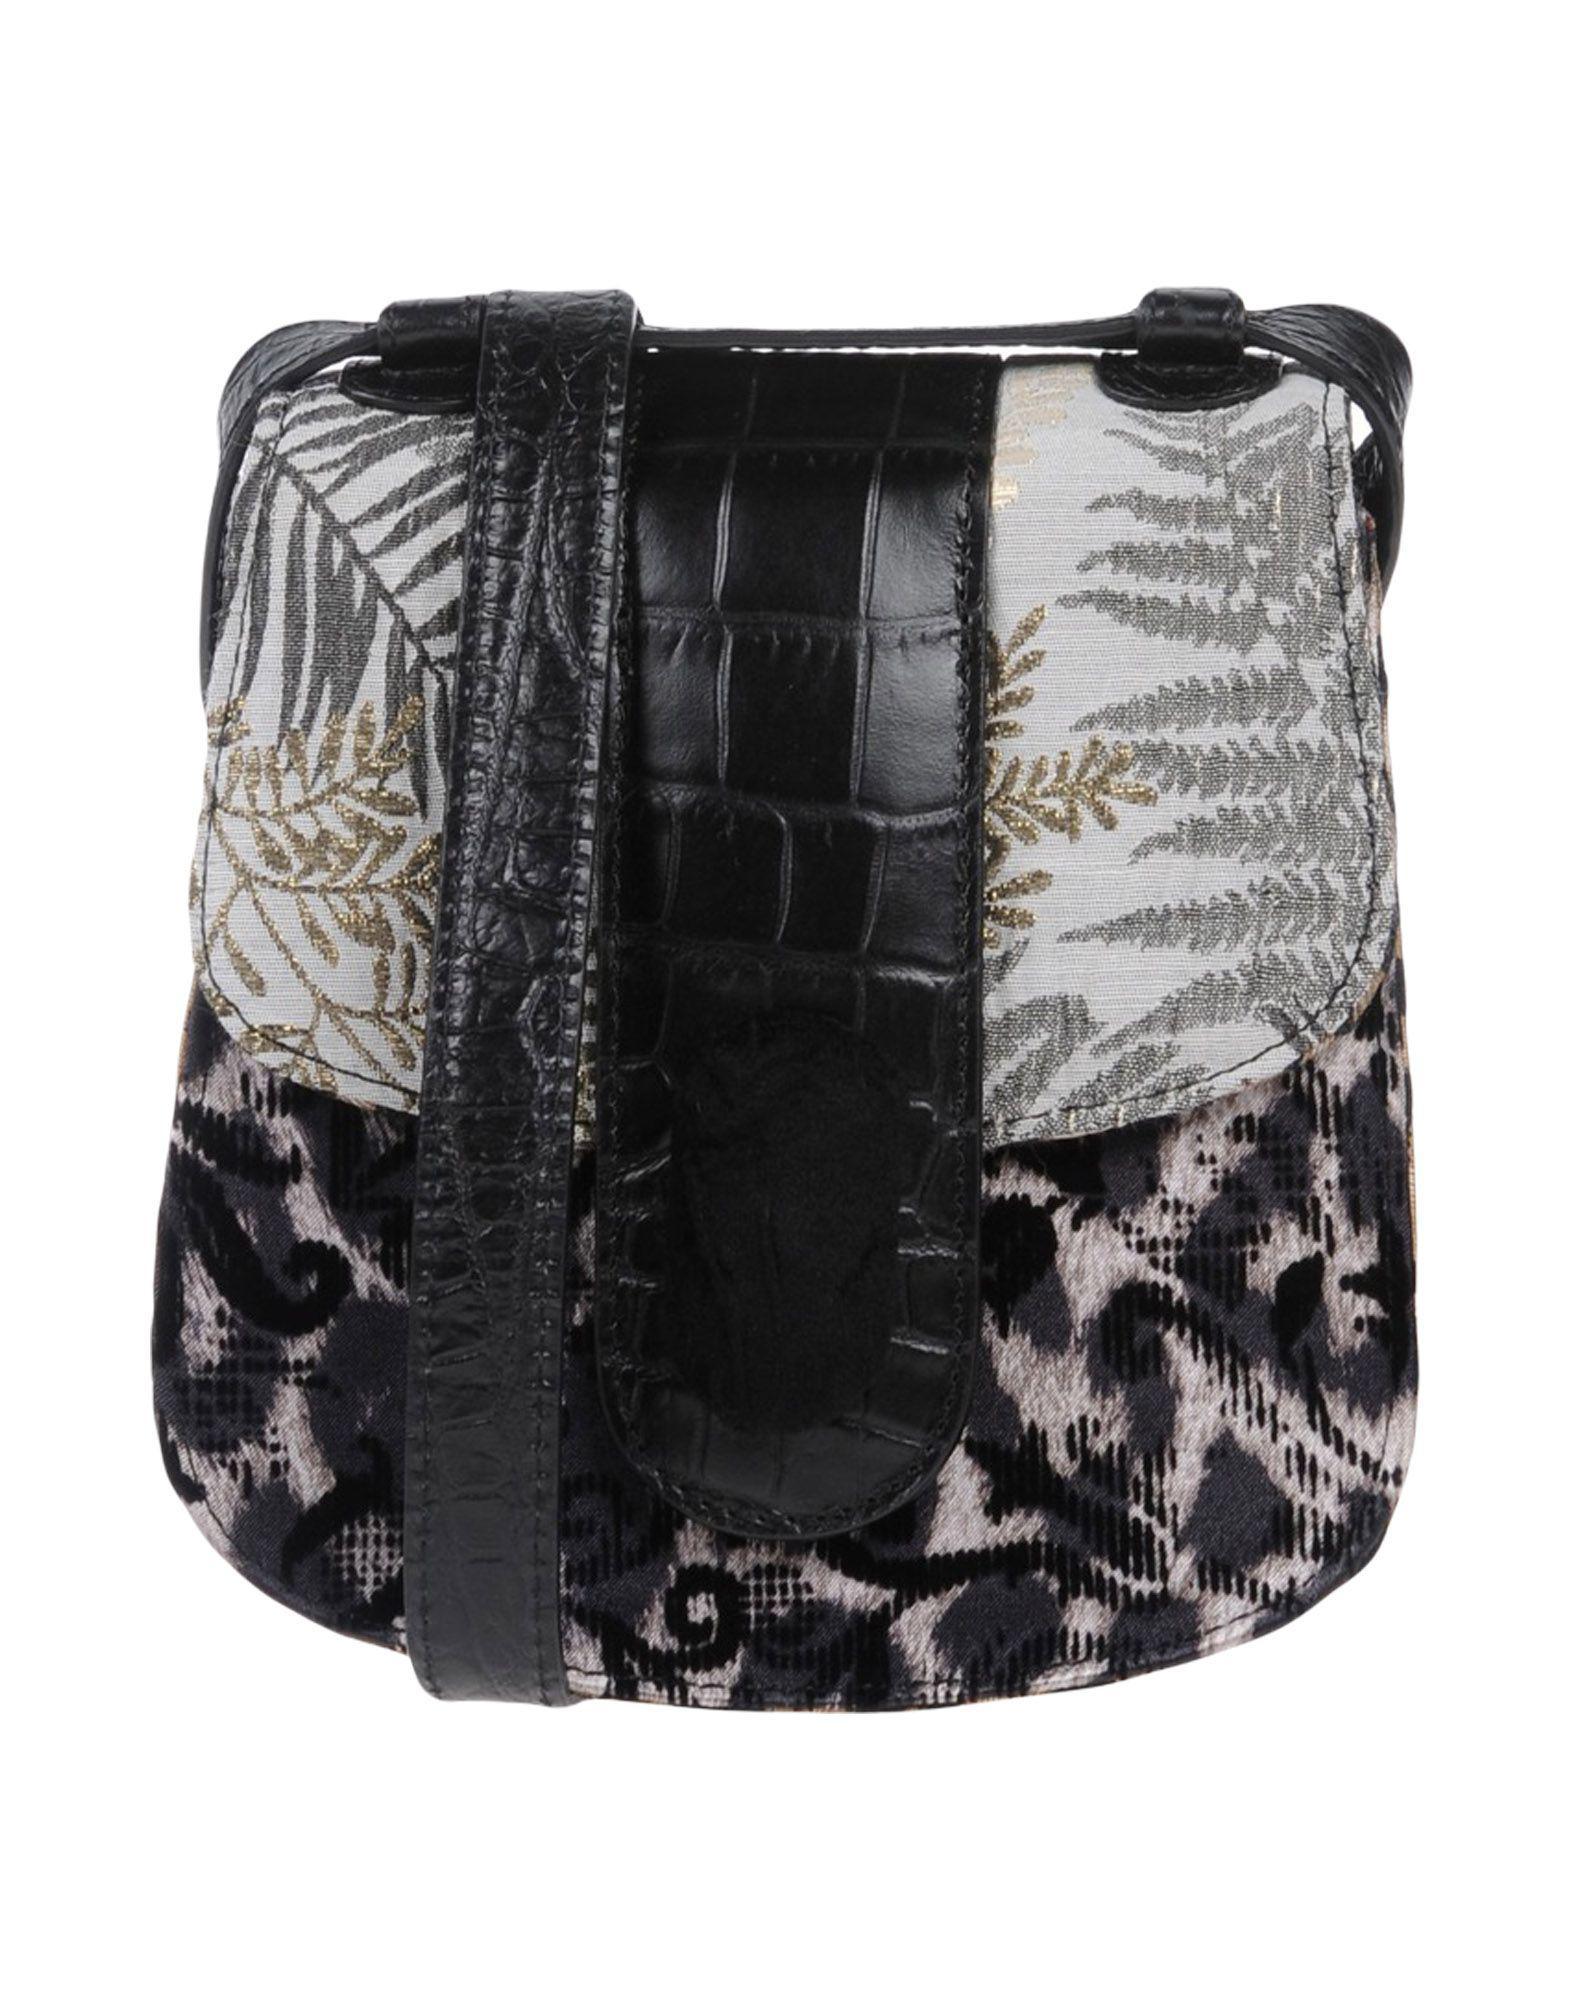 HANDBAGS - Cross-body bags Antonio Marras Clearance Manchester Great Sale 387zMH